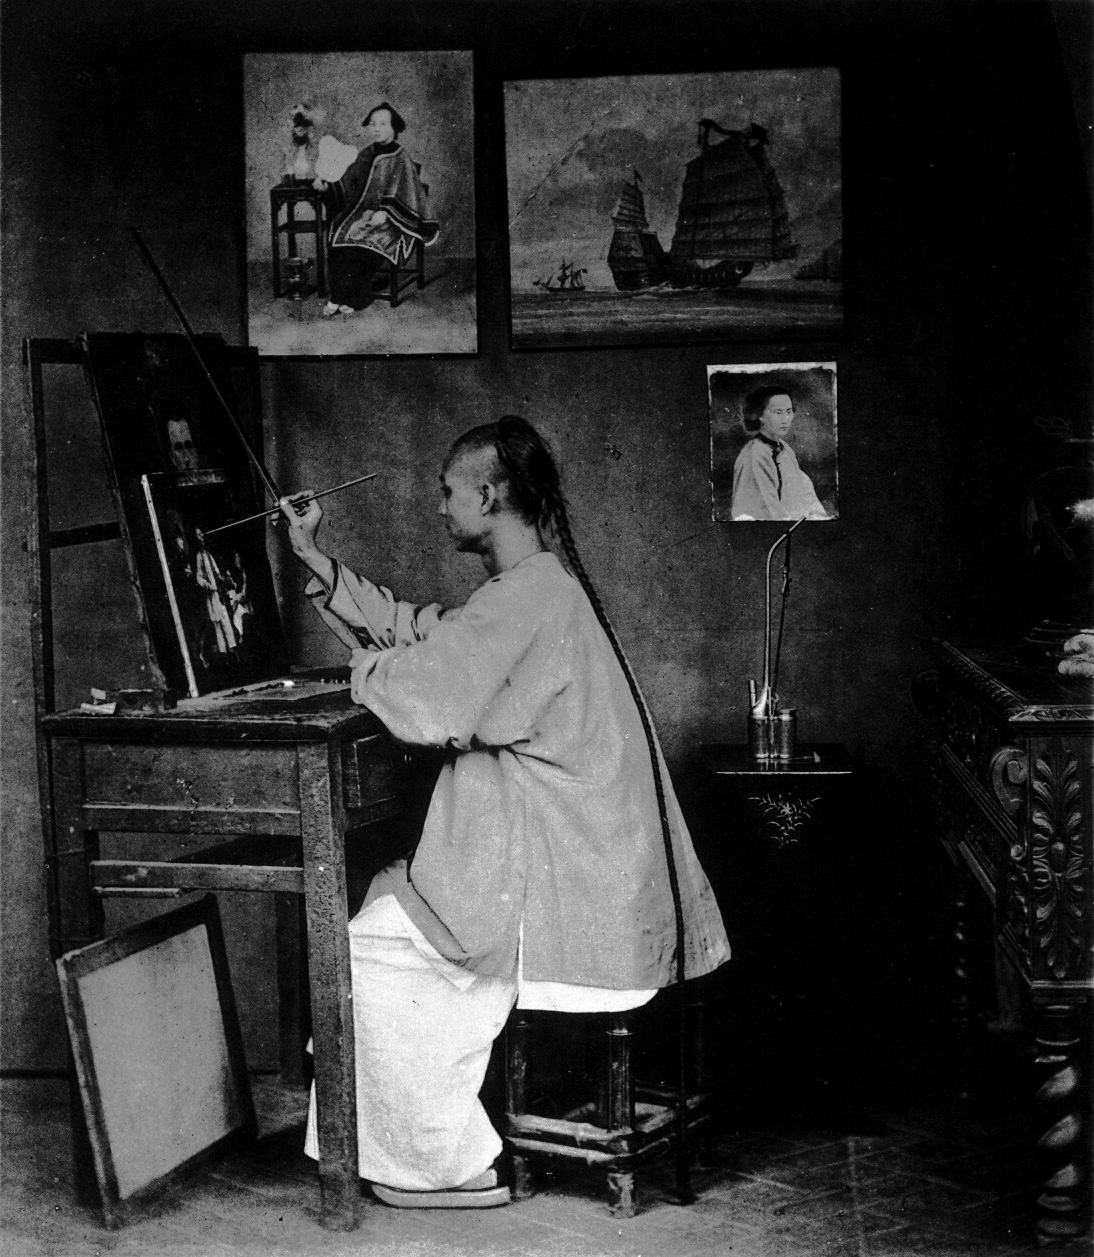 John Thomson's photograph of Guan Qiaochang Lamqua (19th century) (via Beinecke Rare Book & Manuscript Library/Wikimedia)